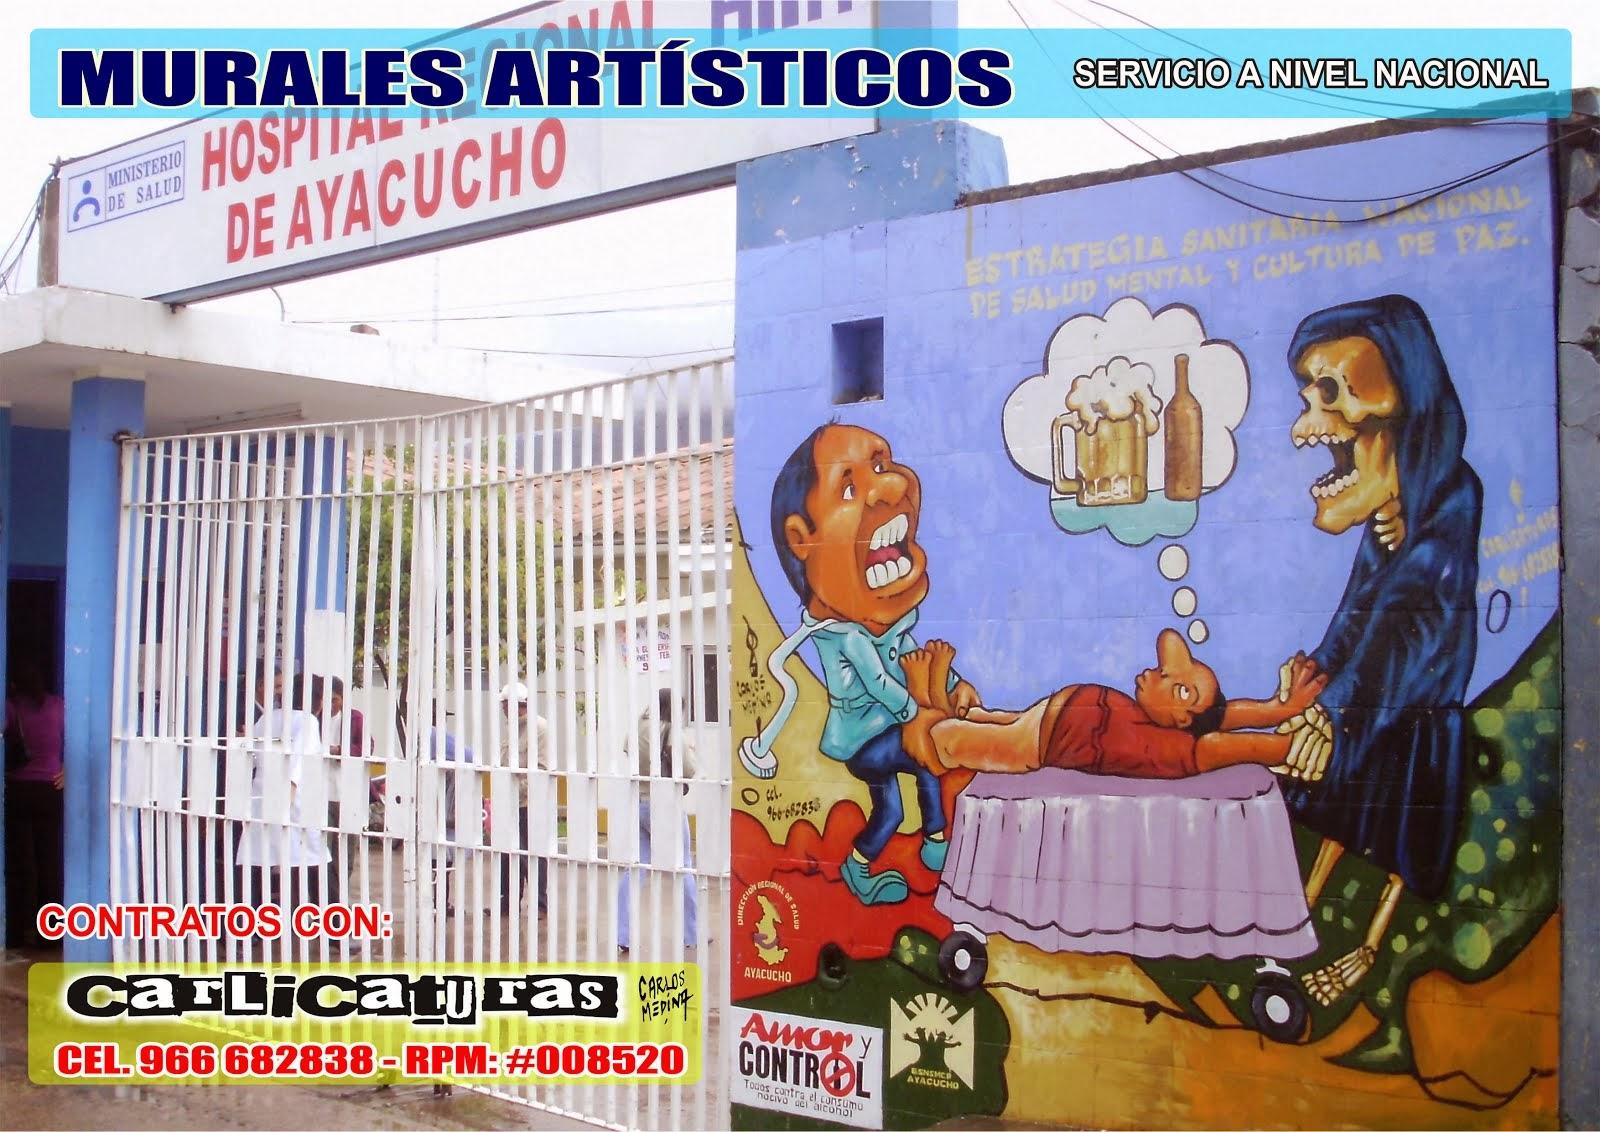 PINTURA MURAL EN EL HOSPITAL REGIONAL DE AYACUCHO